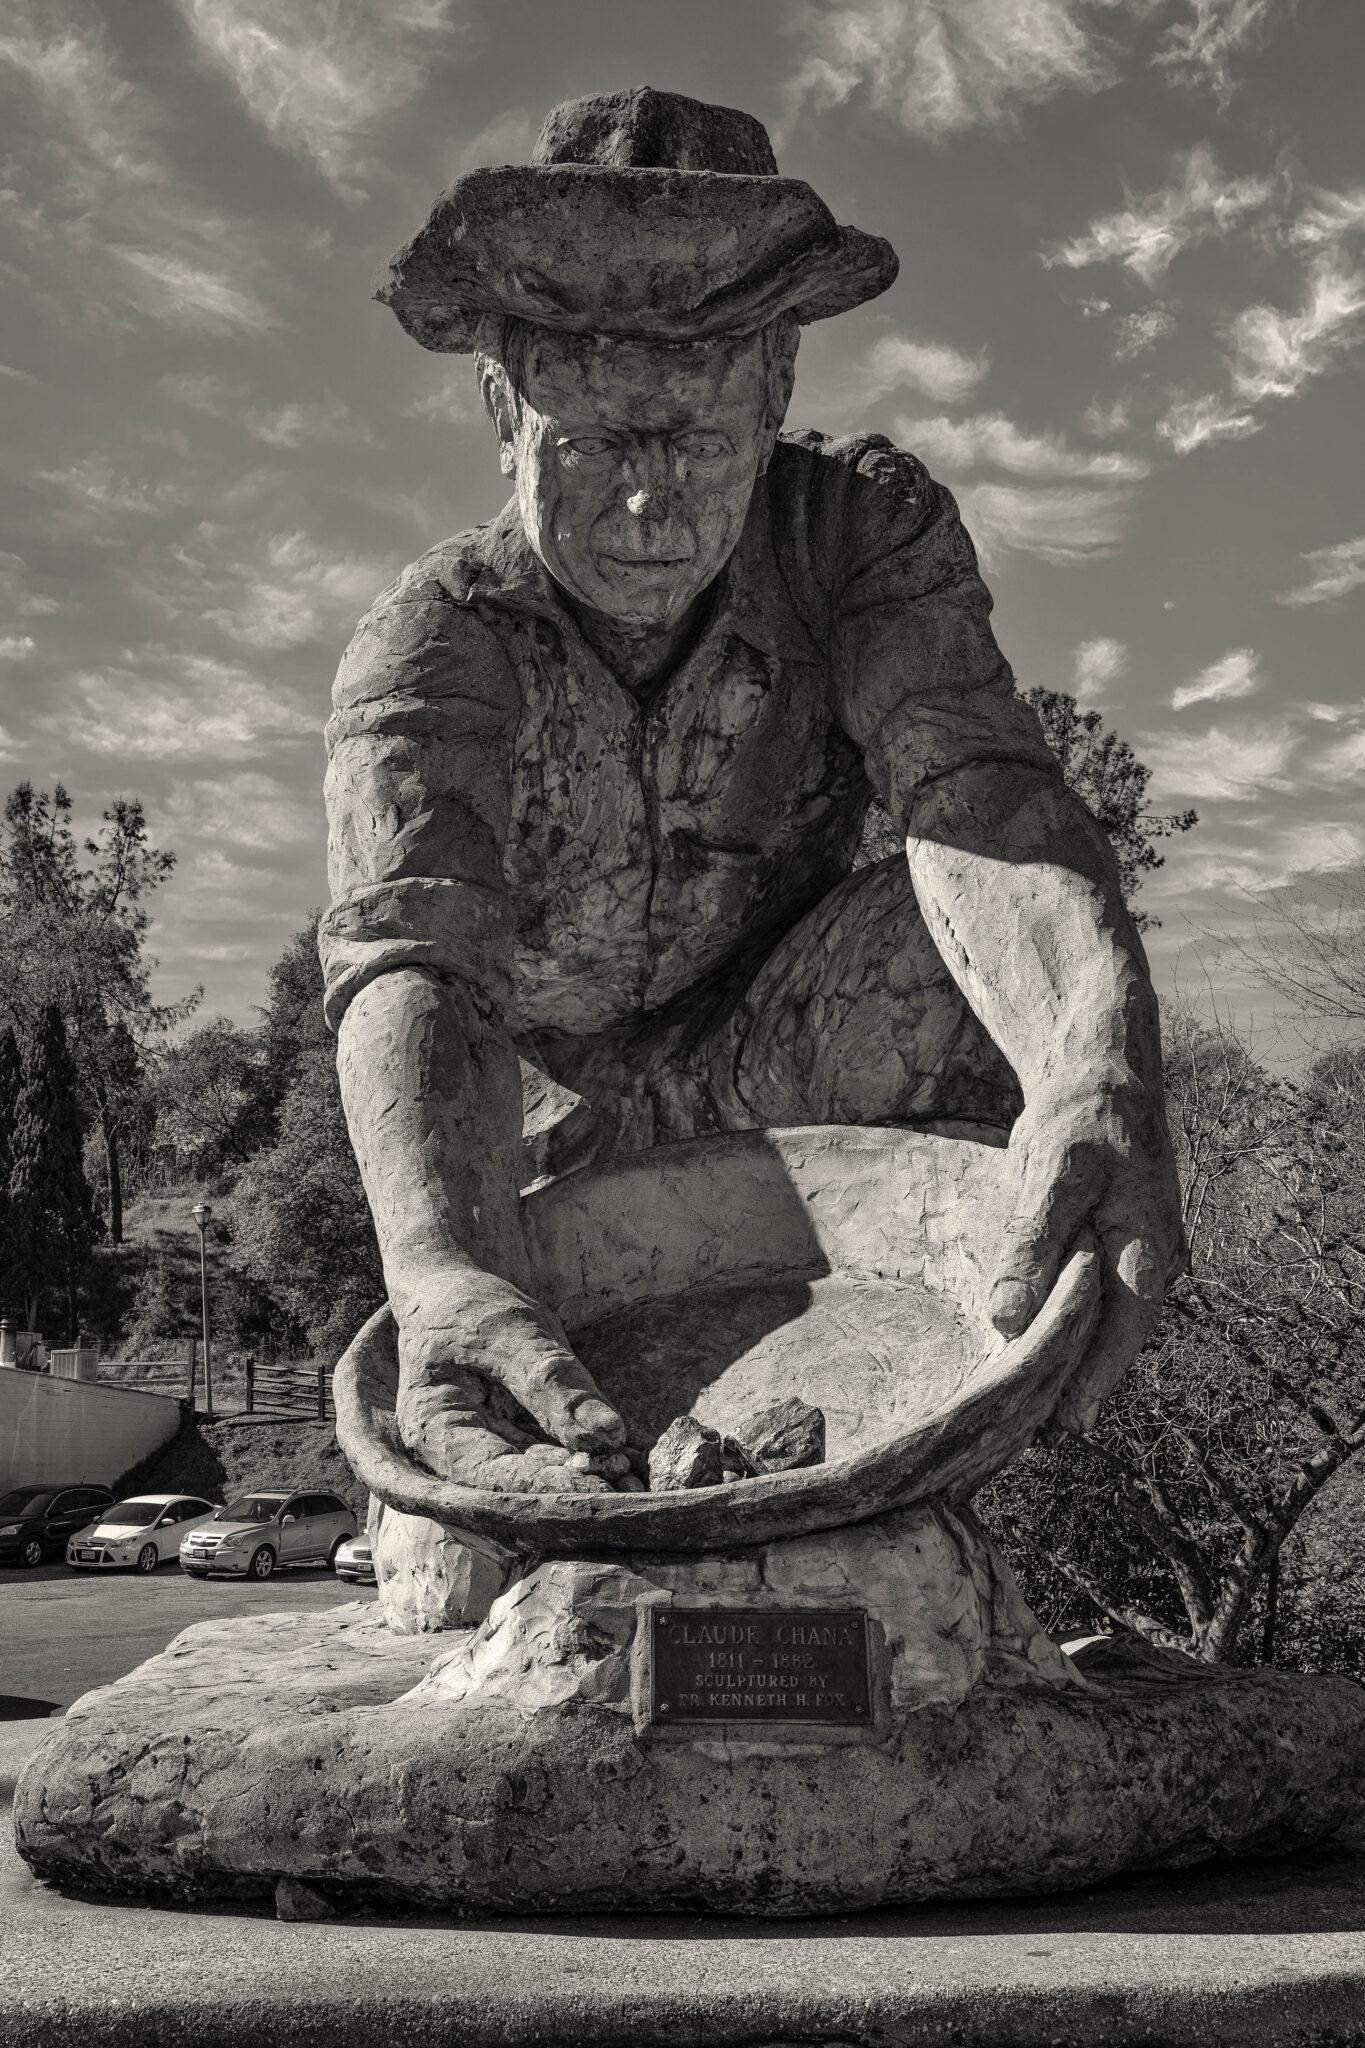 black and white photo ken fox statues claude chana auburn california chris allan sunburst public art